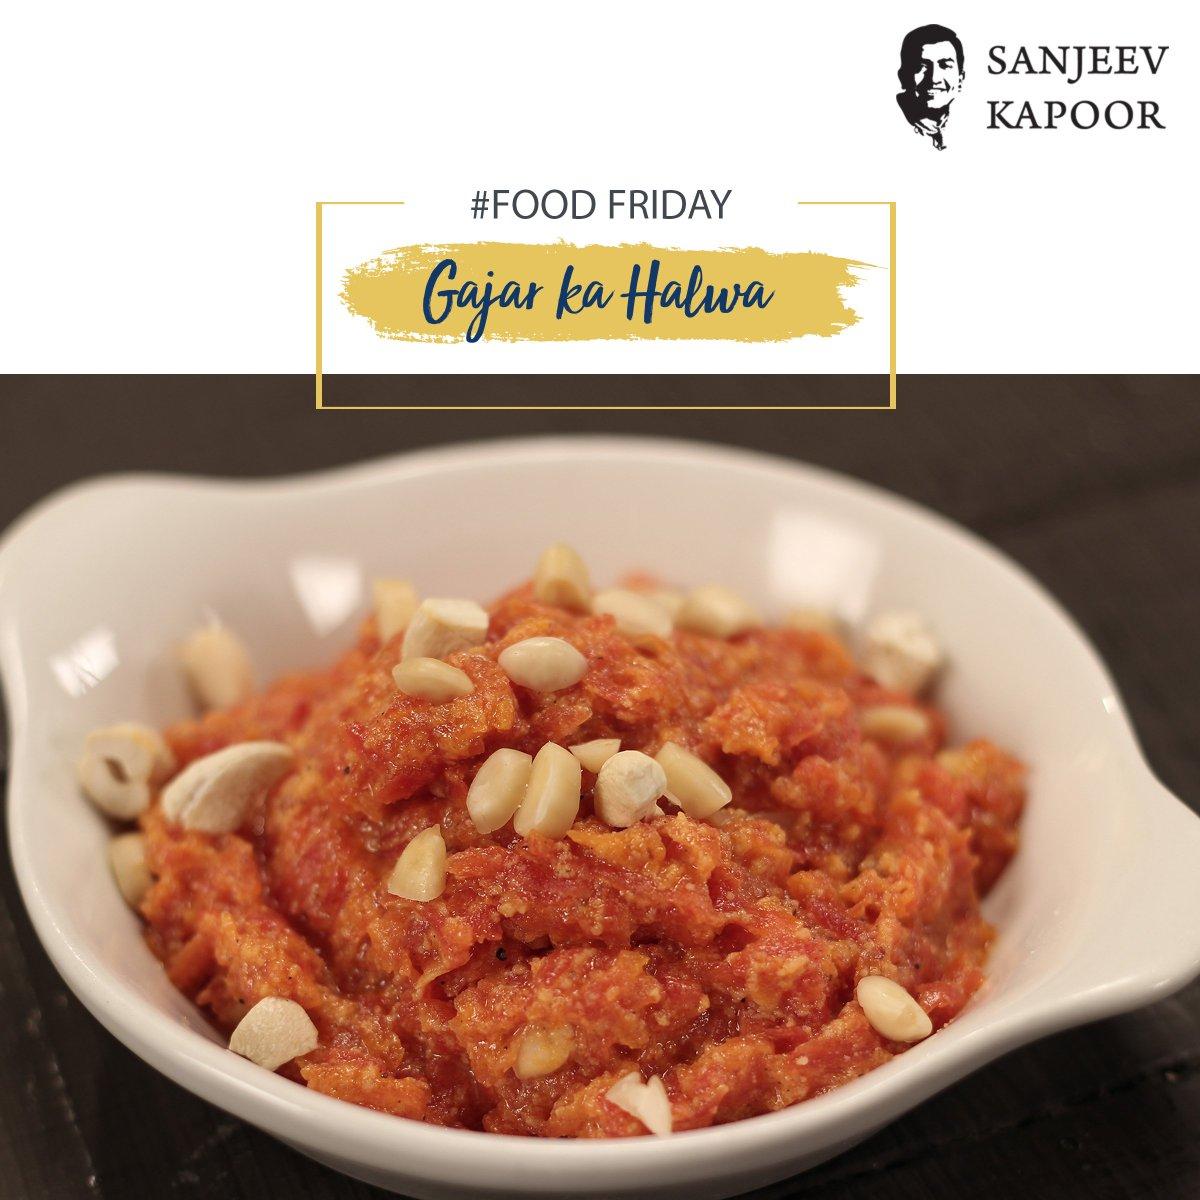 Kanchan Batra Kanchanbatra10 Twitter Though gajar ka halwa originated in the mughal kitchens, it has become a popular sweet dish in the state of punjab. twitter